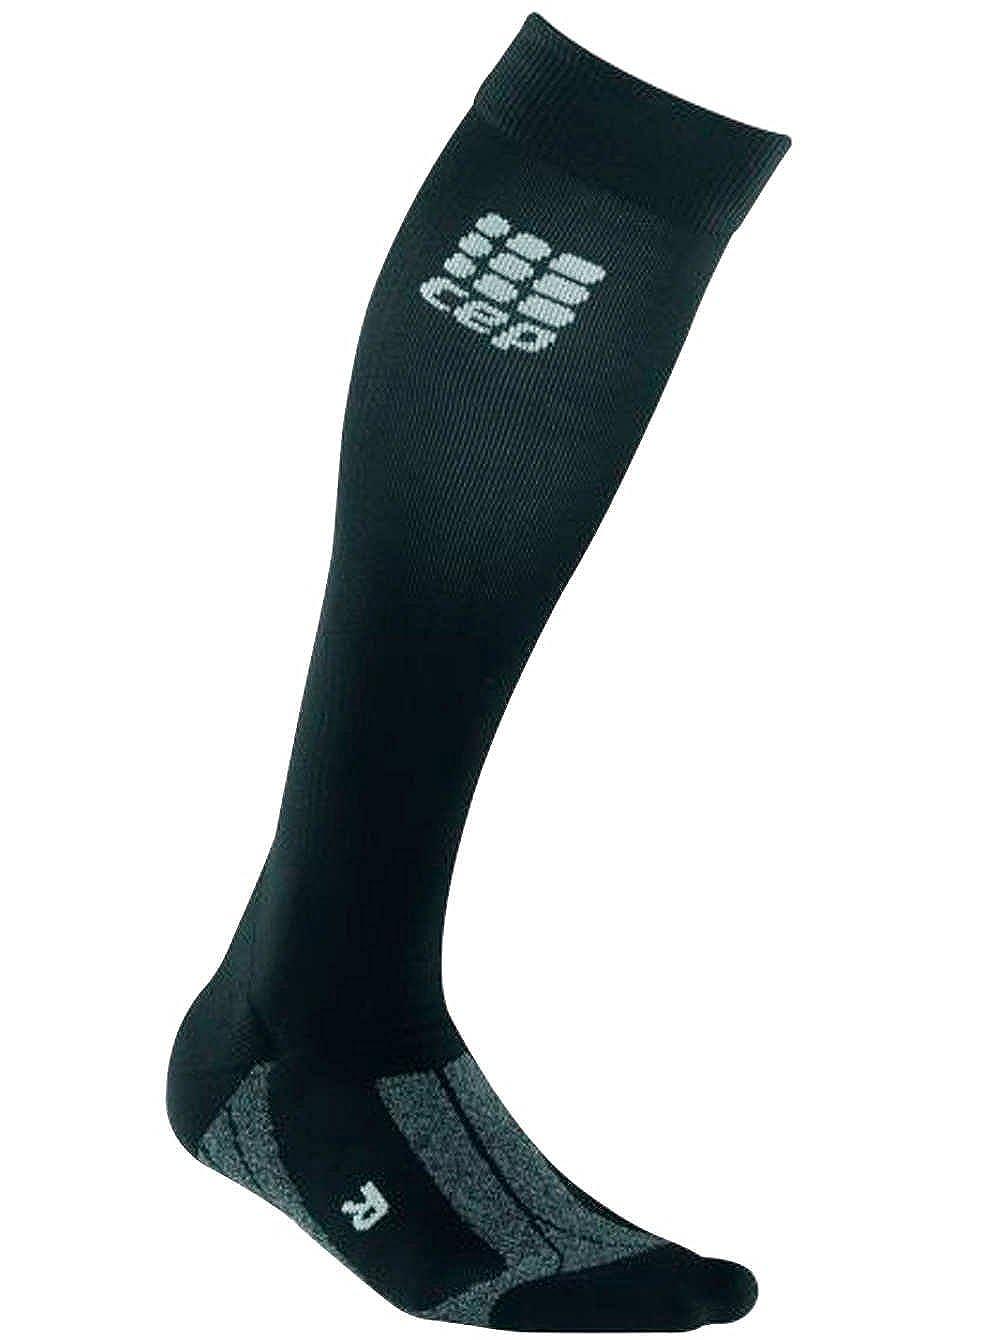 CEP Recovery Socks Compression Socks Wmn Black